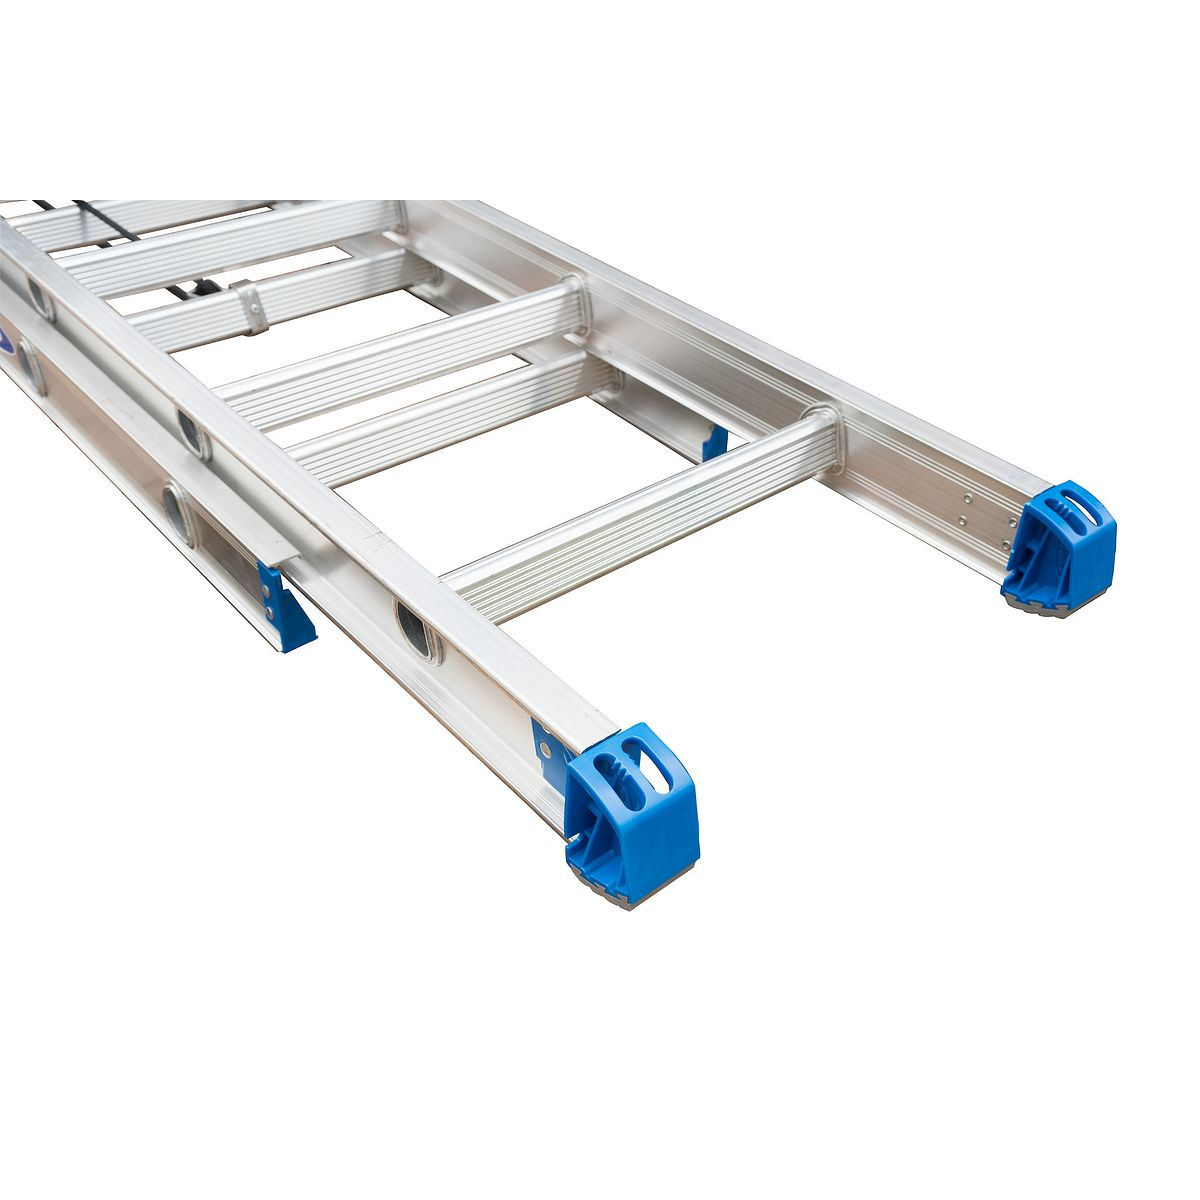 D1824 2eq Extension Ladders Werner Us